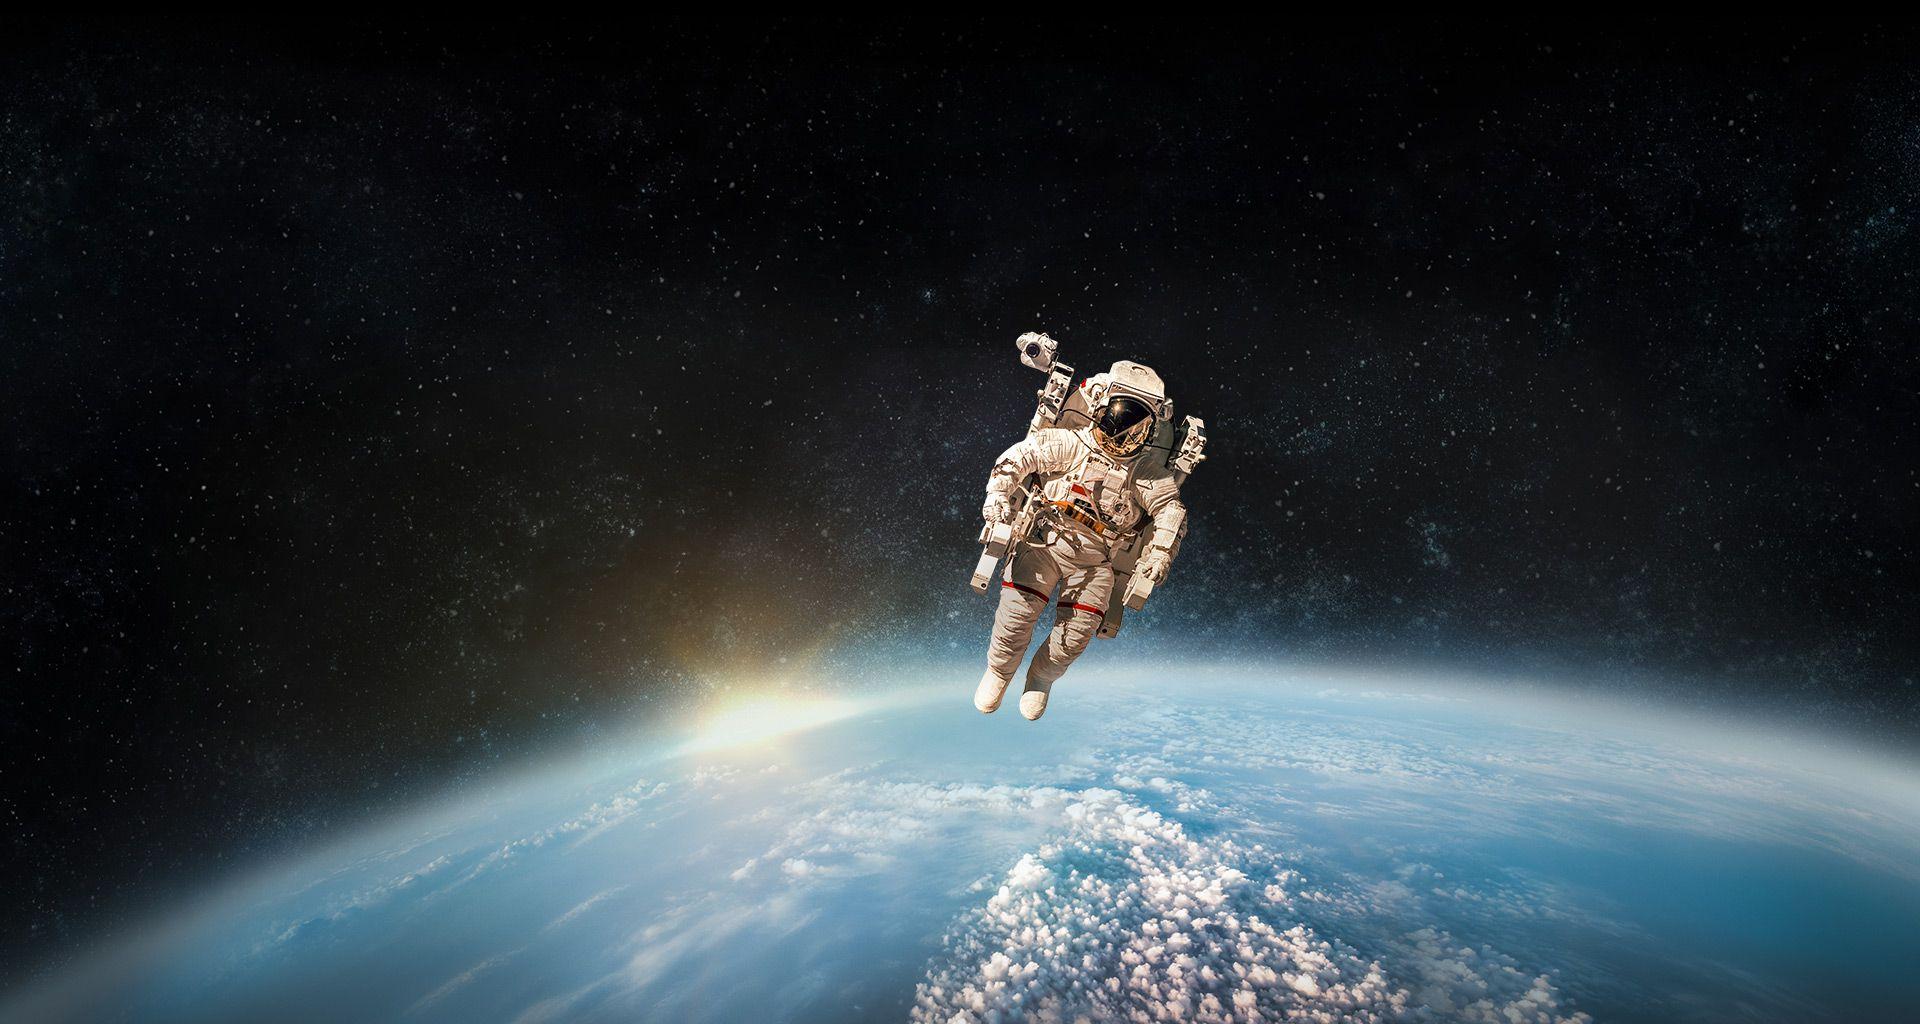 Astronaut Galaxy Wallpapers   Top Astronaut Galaxy 1920x1024